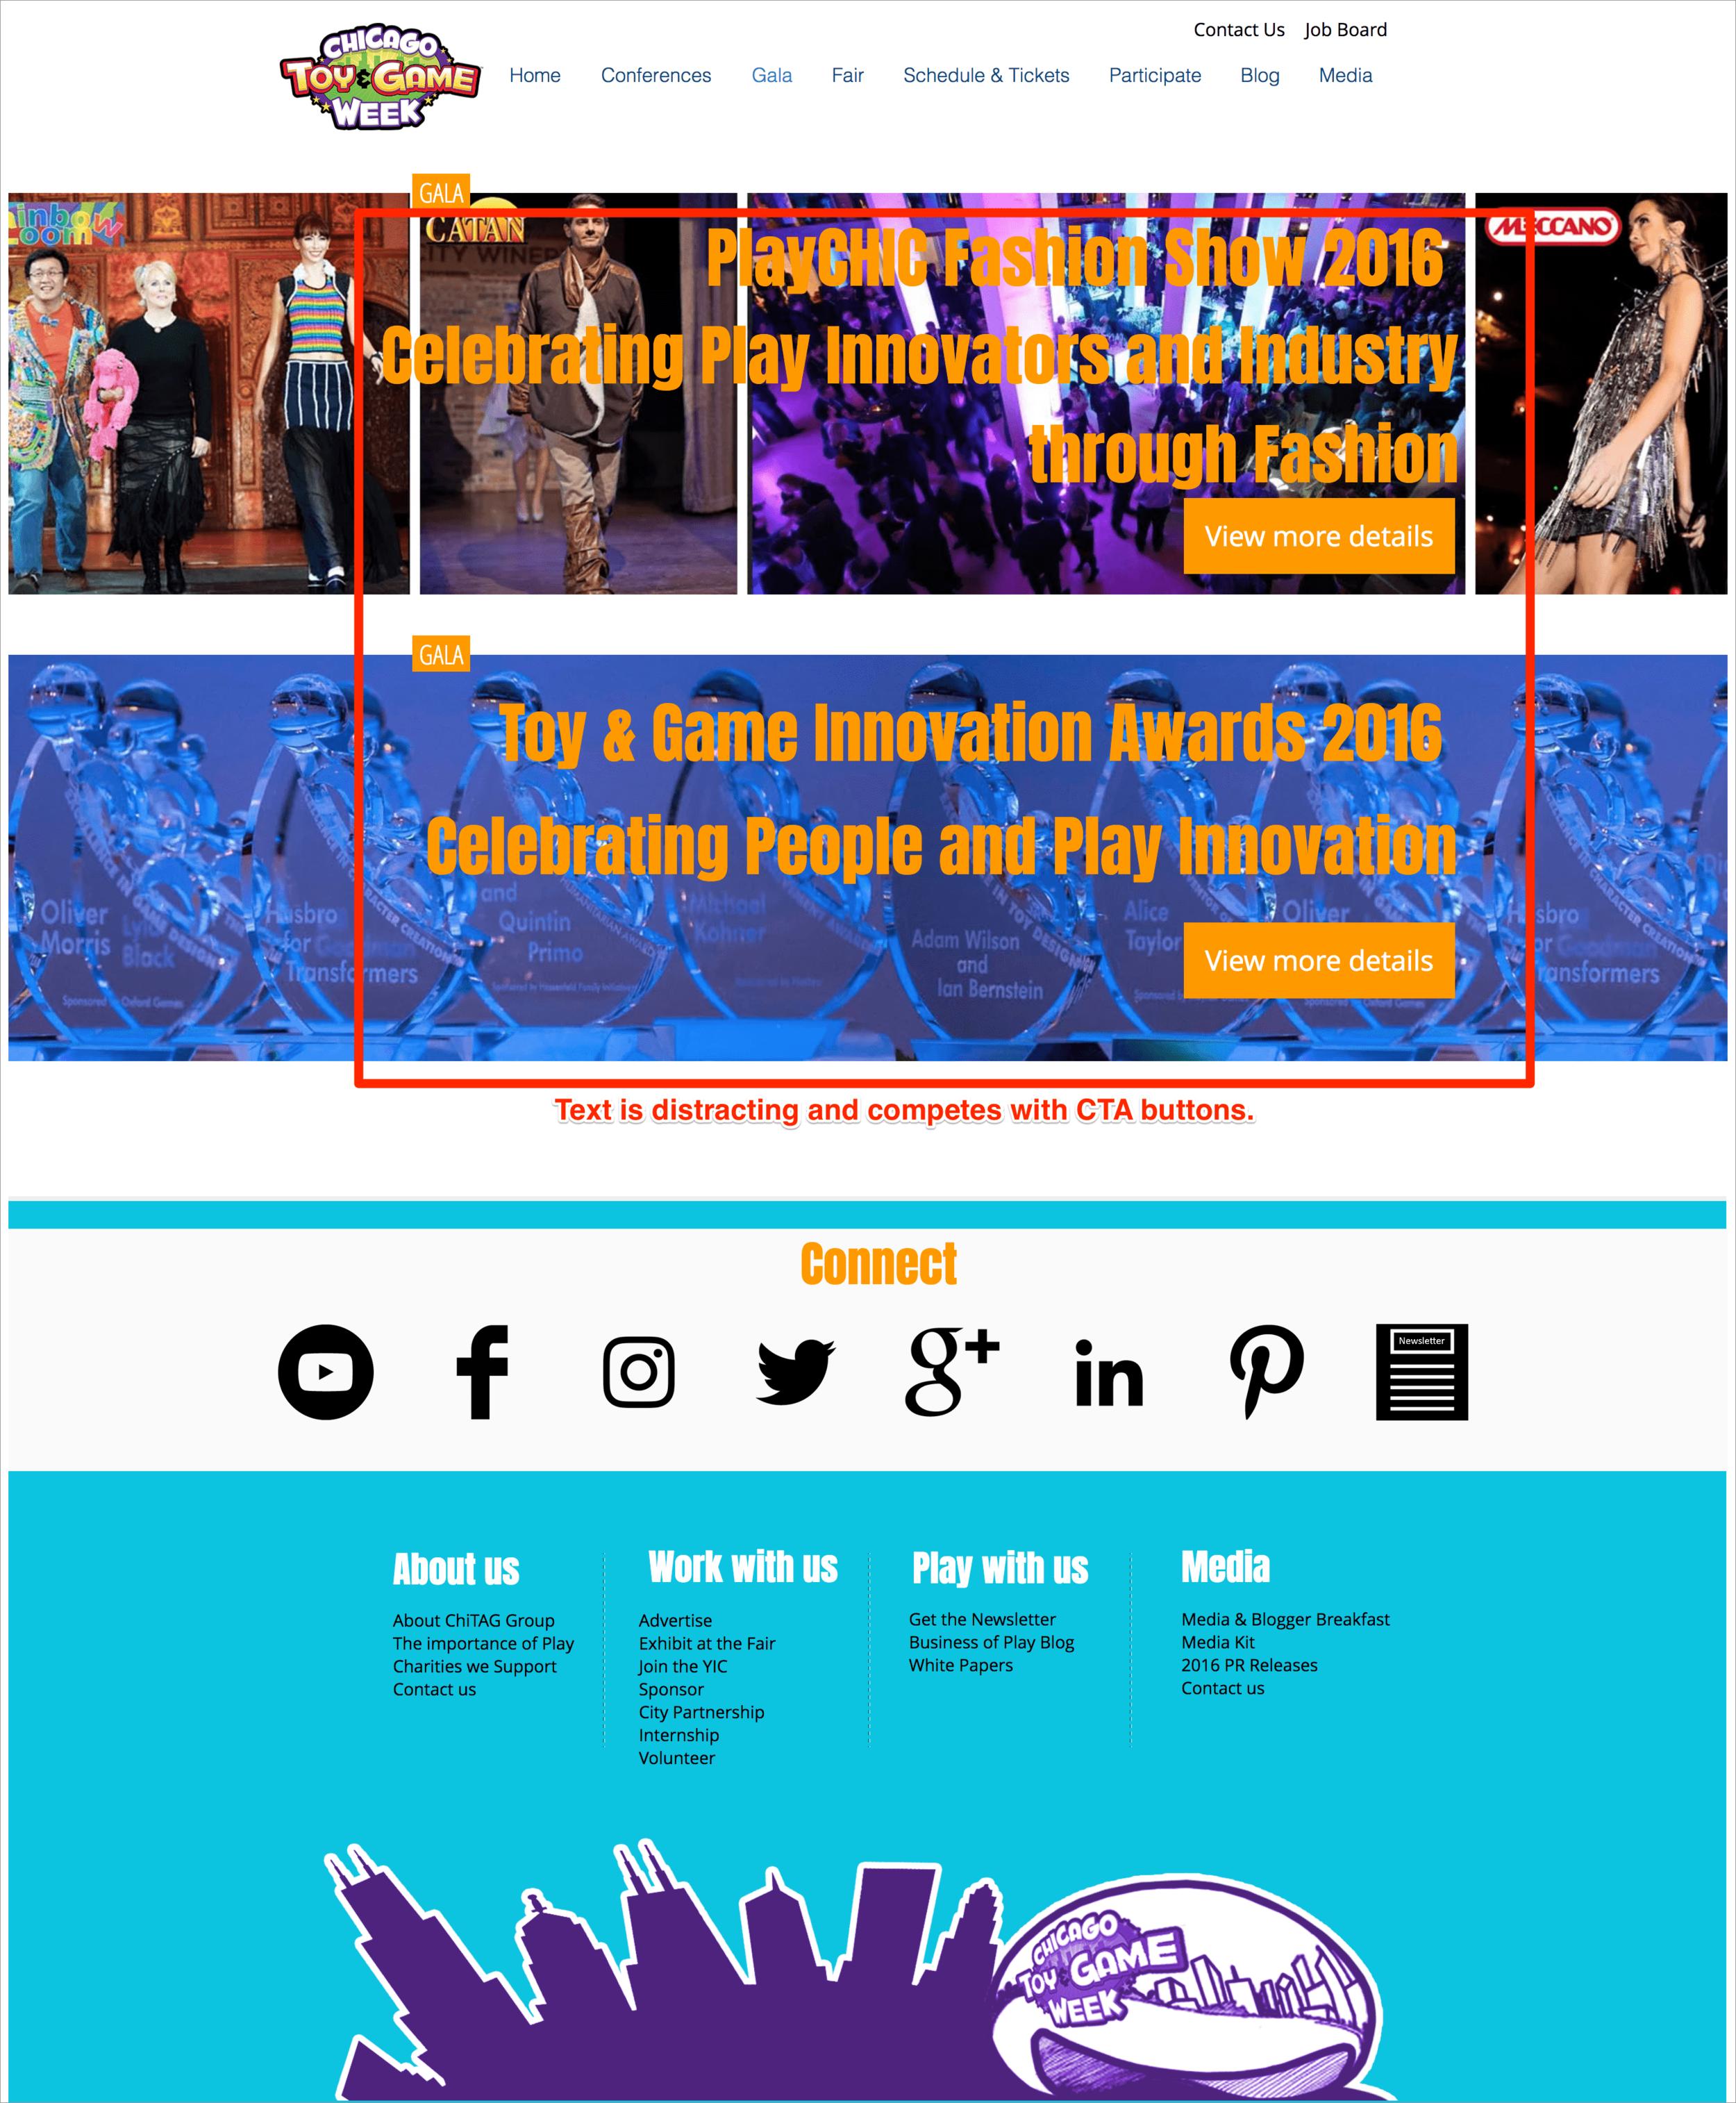 Gala_Events-min_anno-min.png